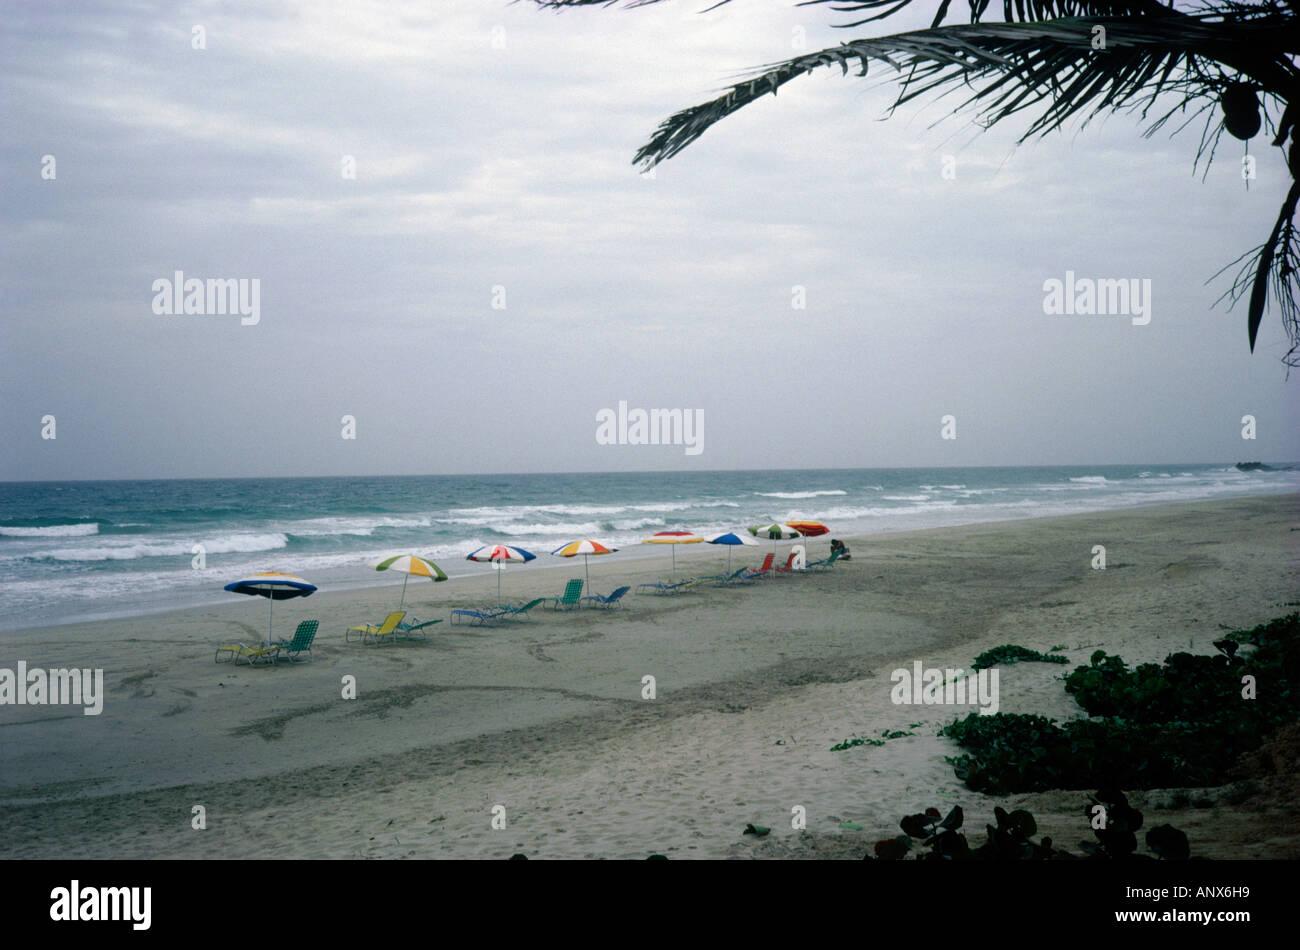 rainy day at beach playa el agua island of margarita venezuela - Stock Image